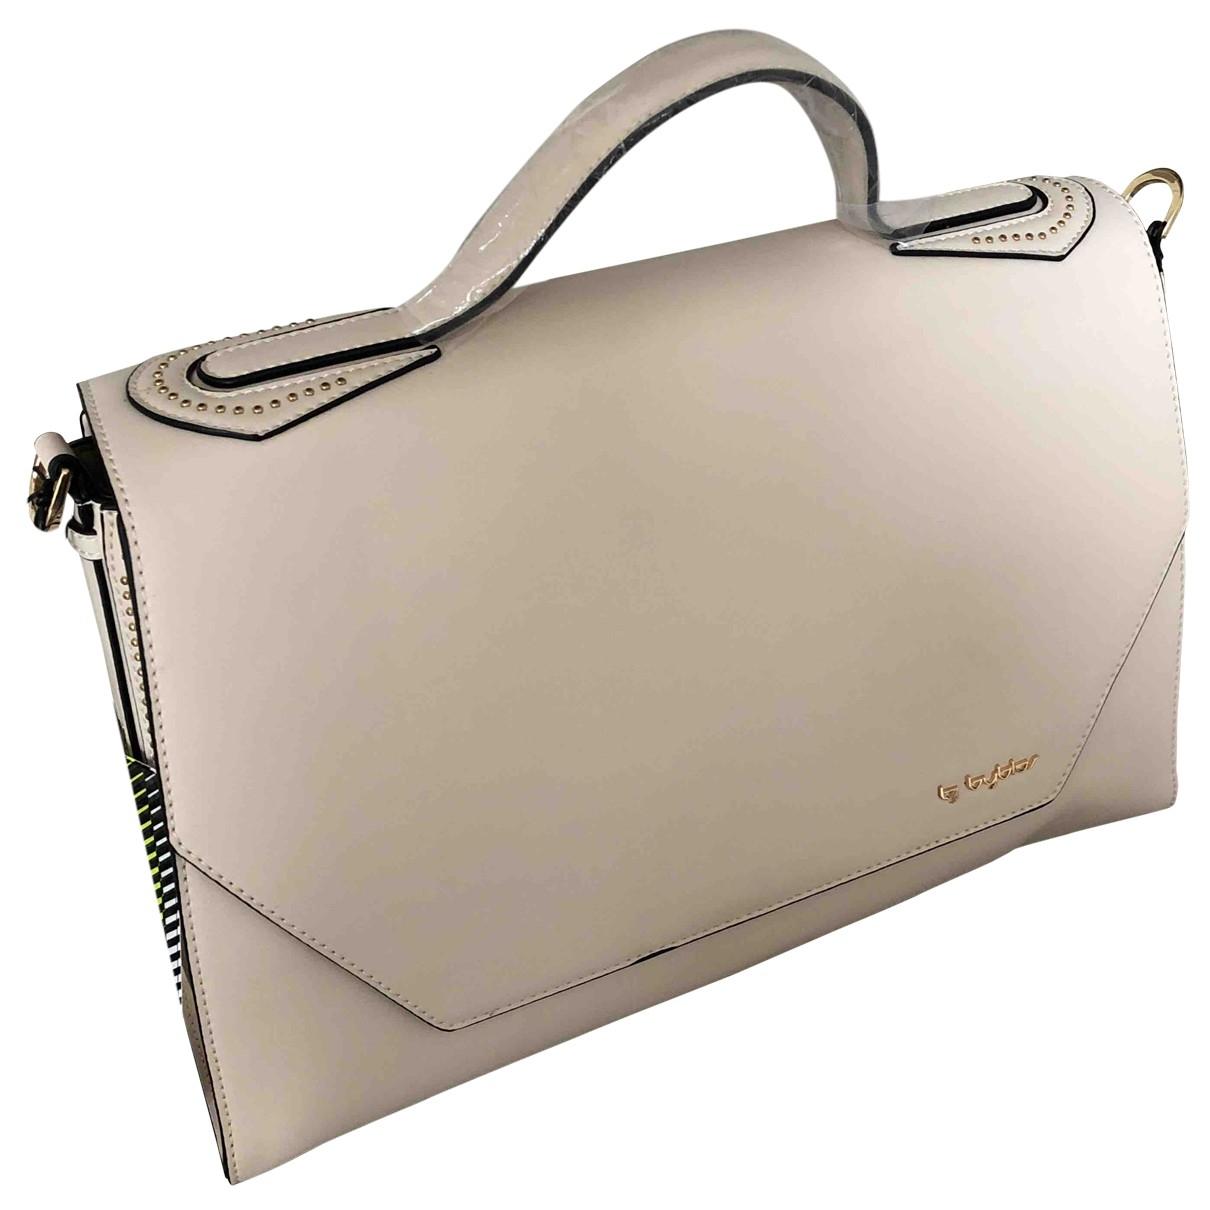 Byblos \N Handtasche in  Beige Synthetik